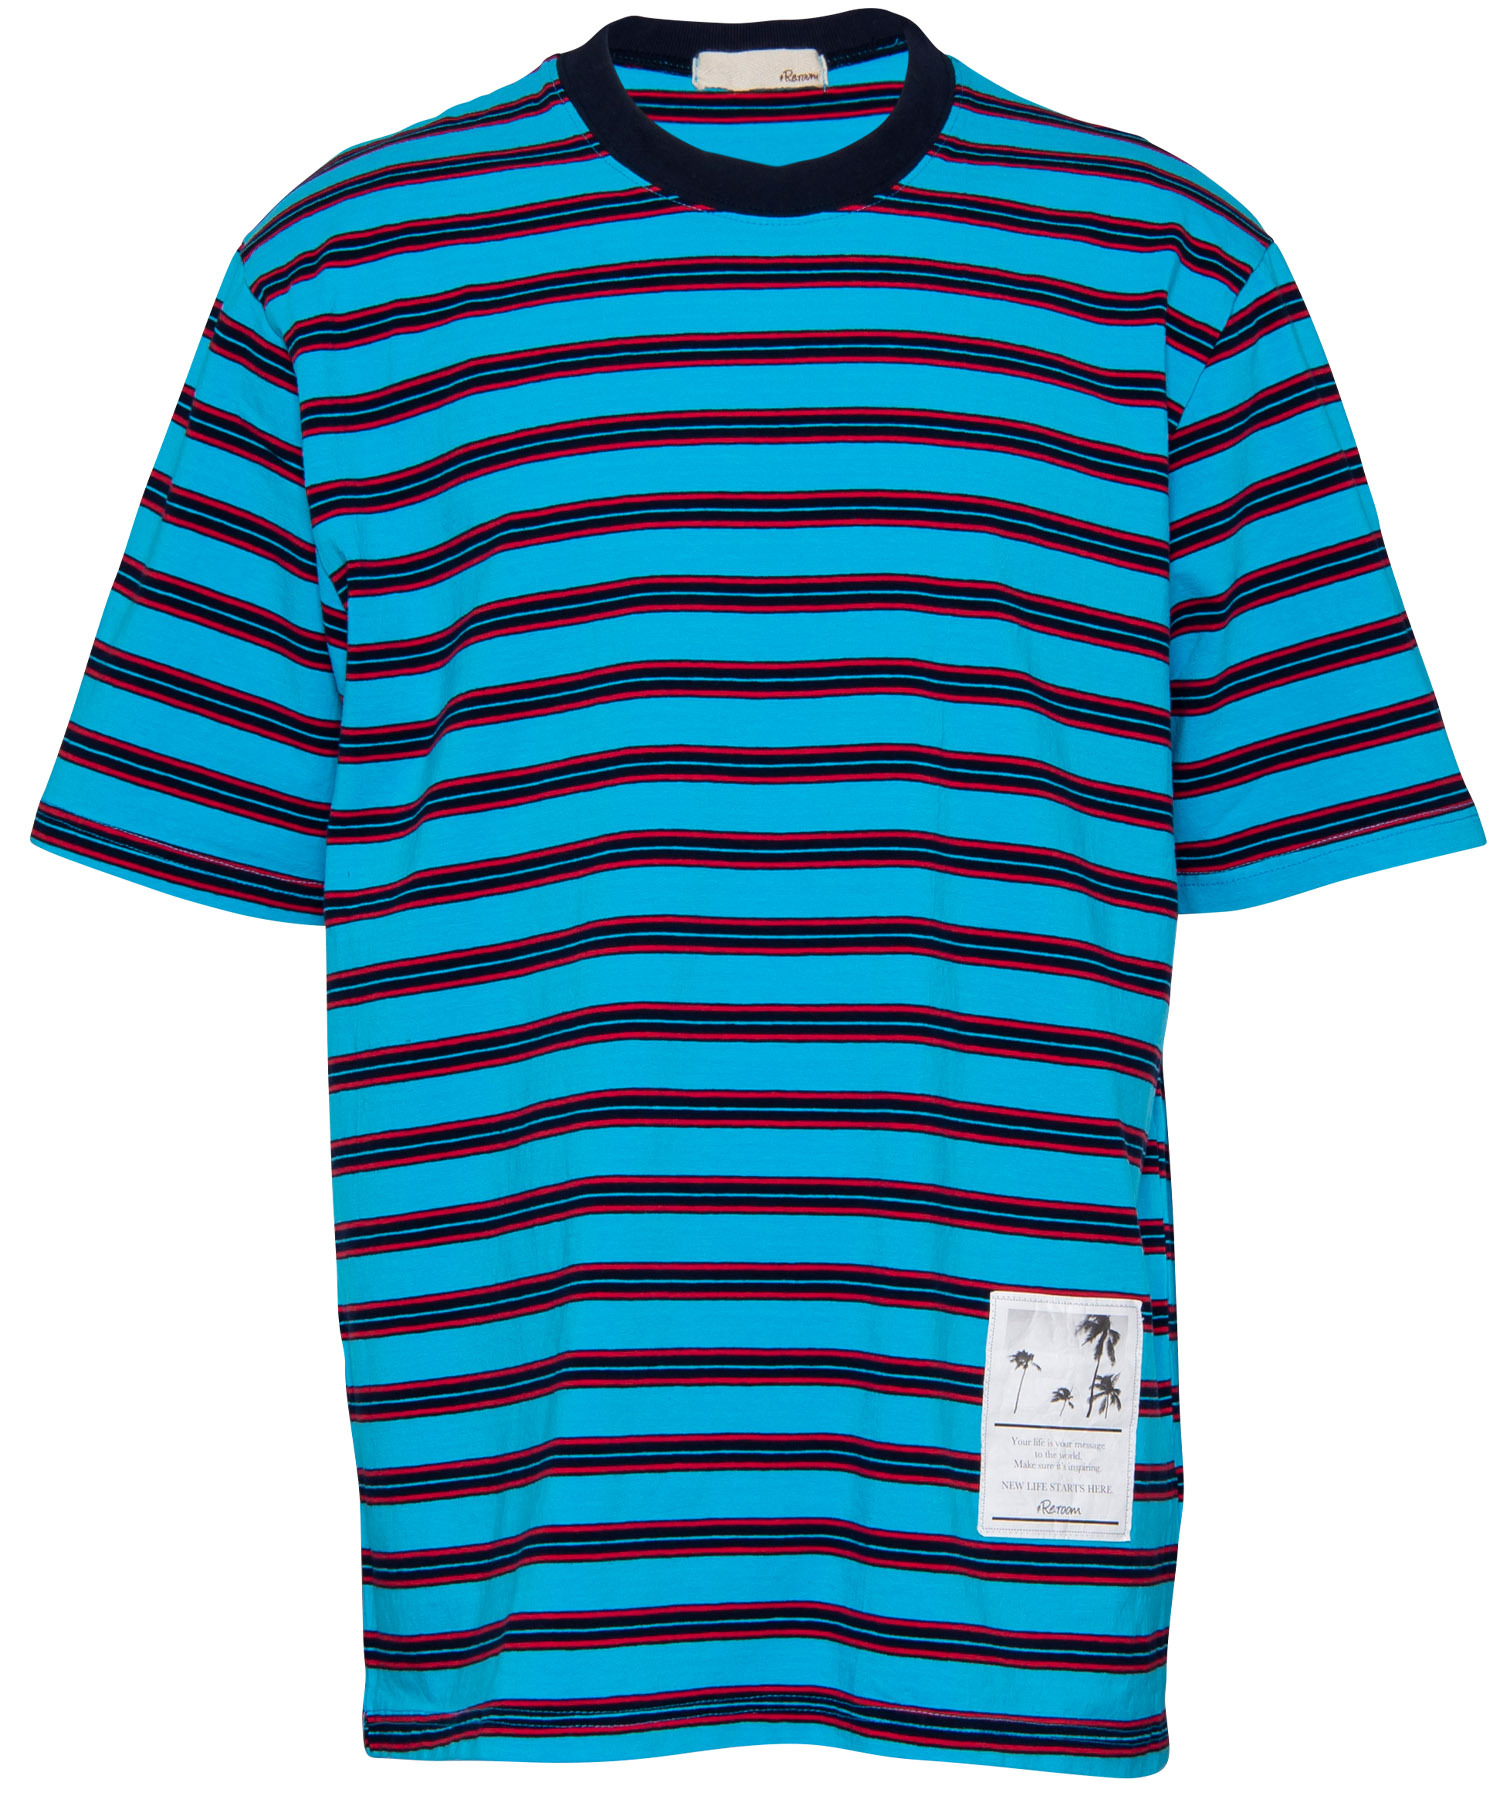 MULTI BORDER BIG T-shirt[REC309]